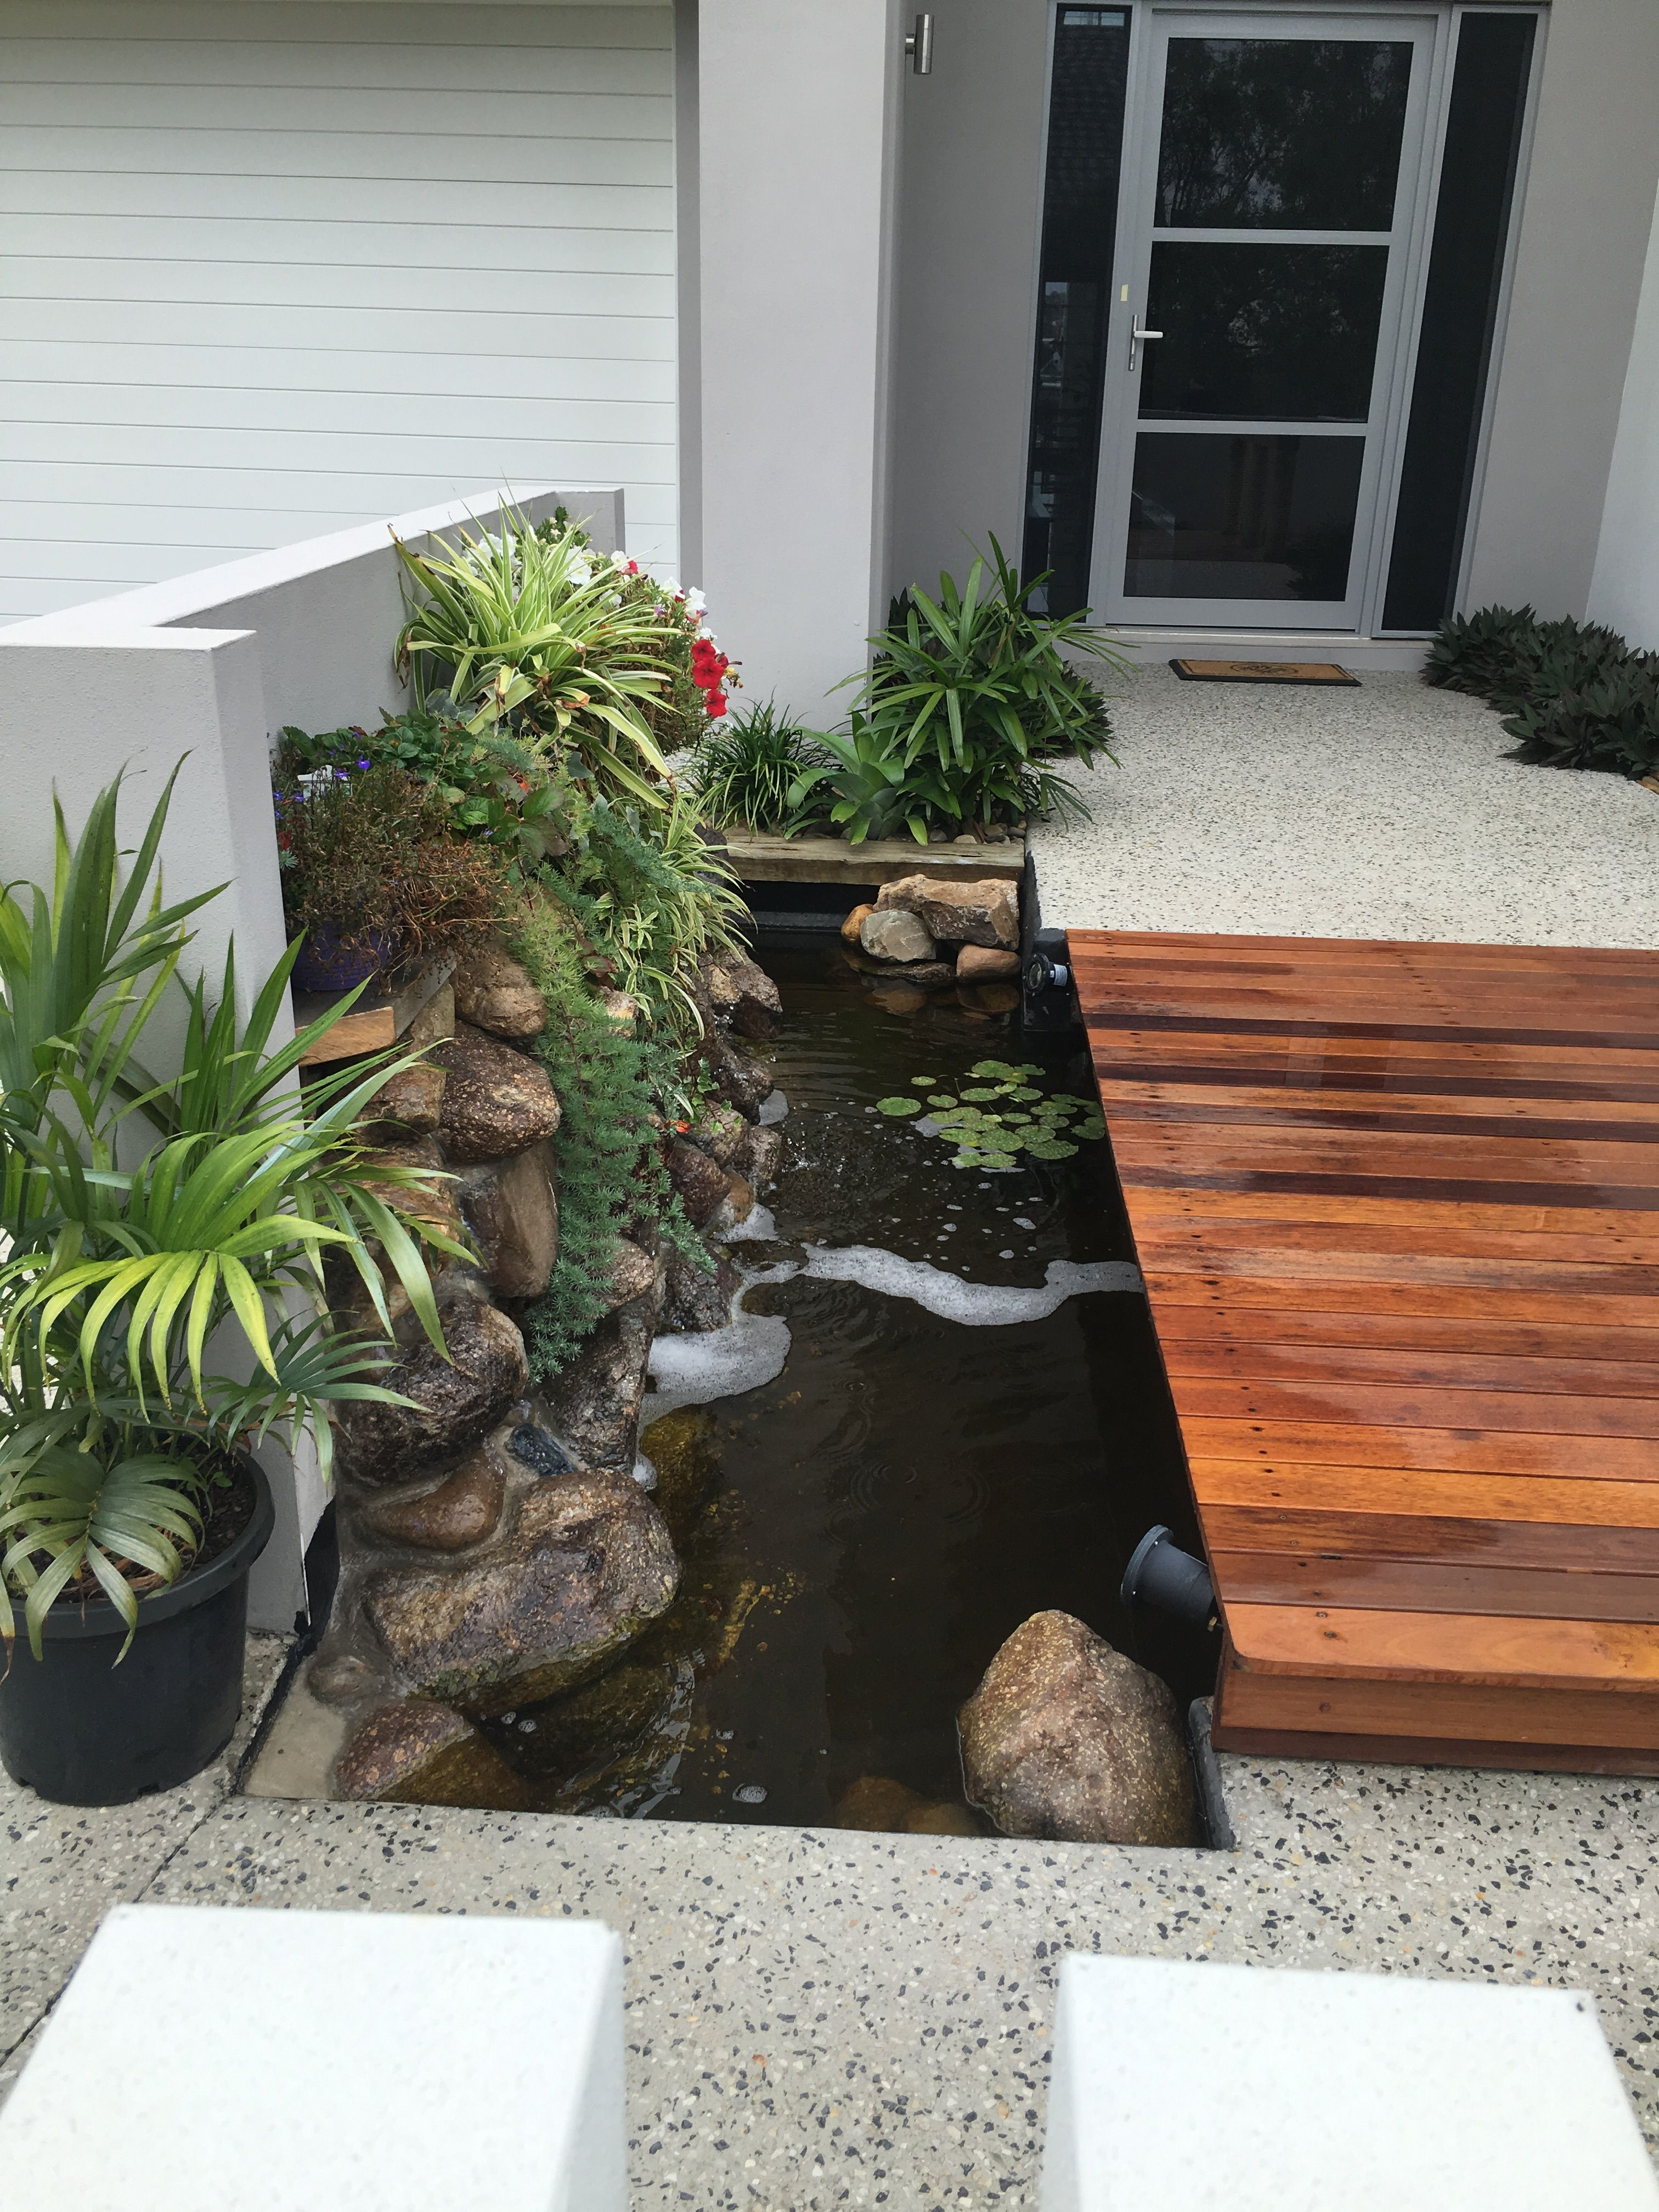 Pin by Tarnz on B2 | Garden pond design, Yard water ...